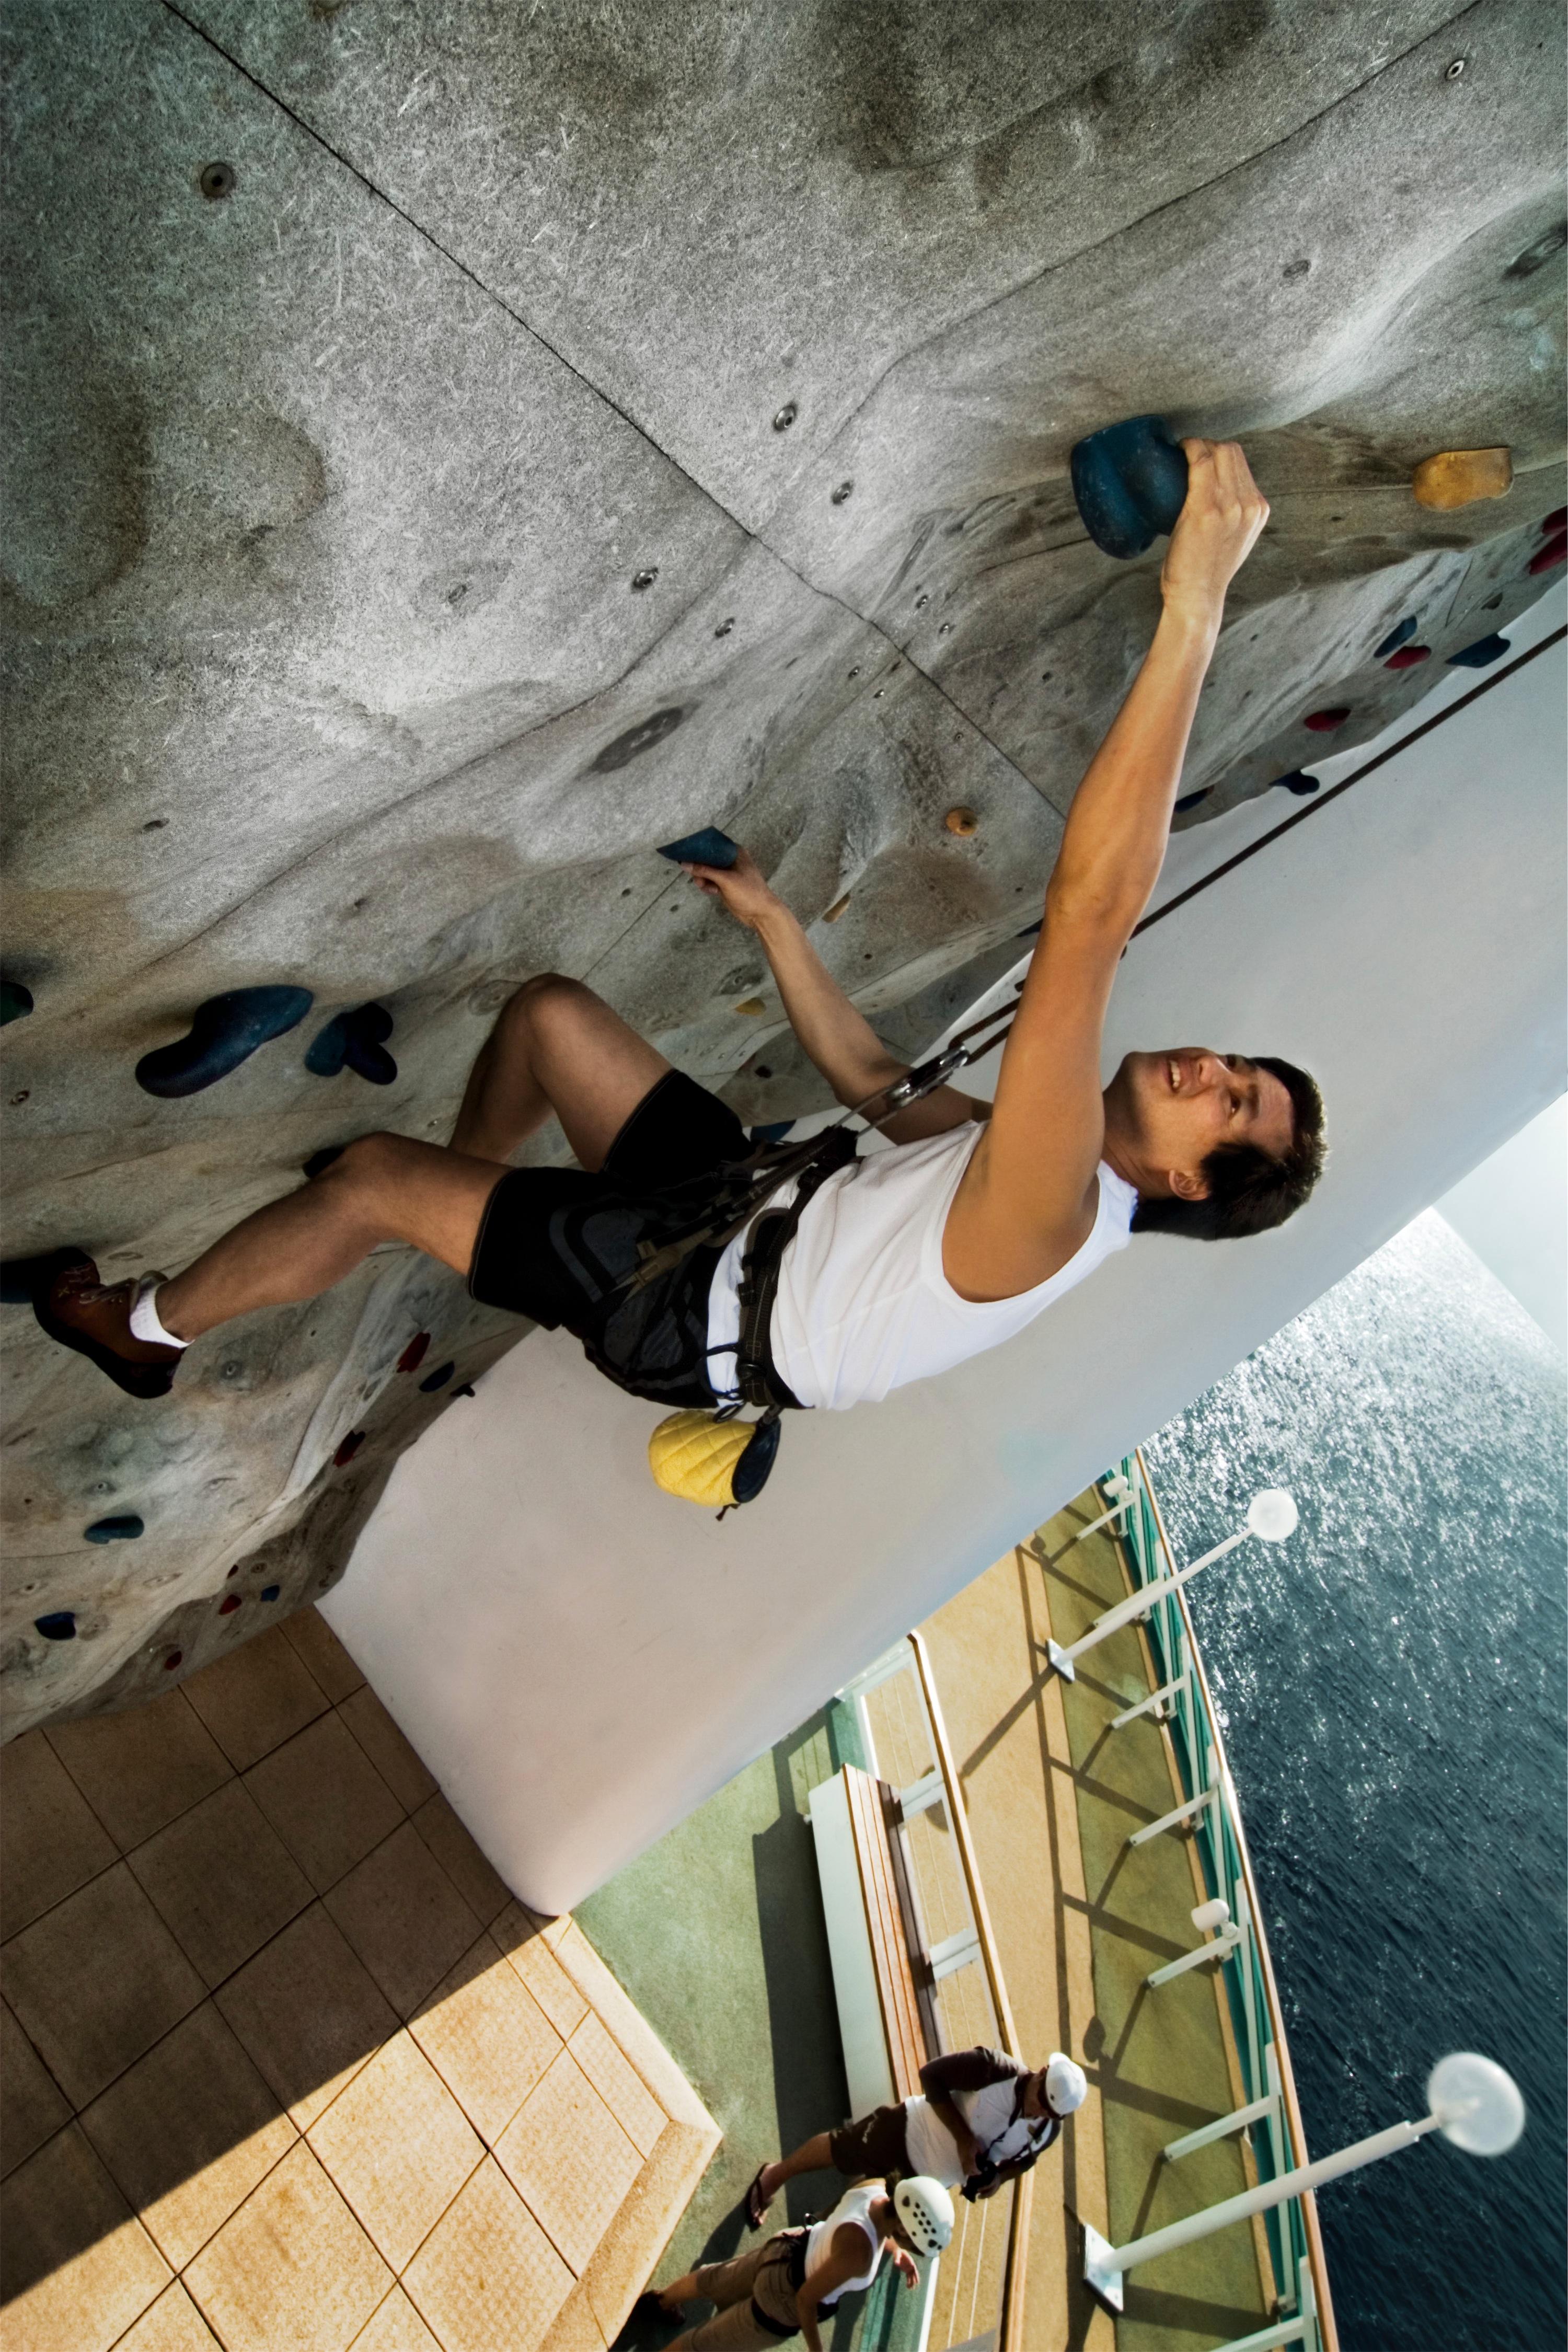 Royal Caribbean International Rhapsody of the Seas Exterior Climbing Wall 6045.jpg